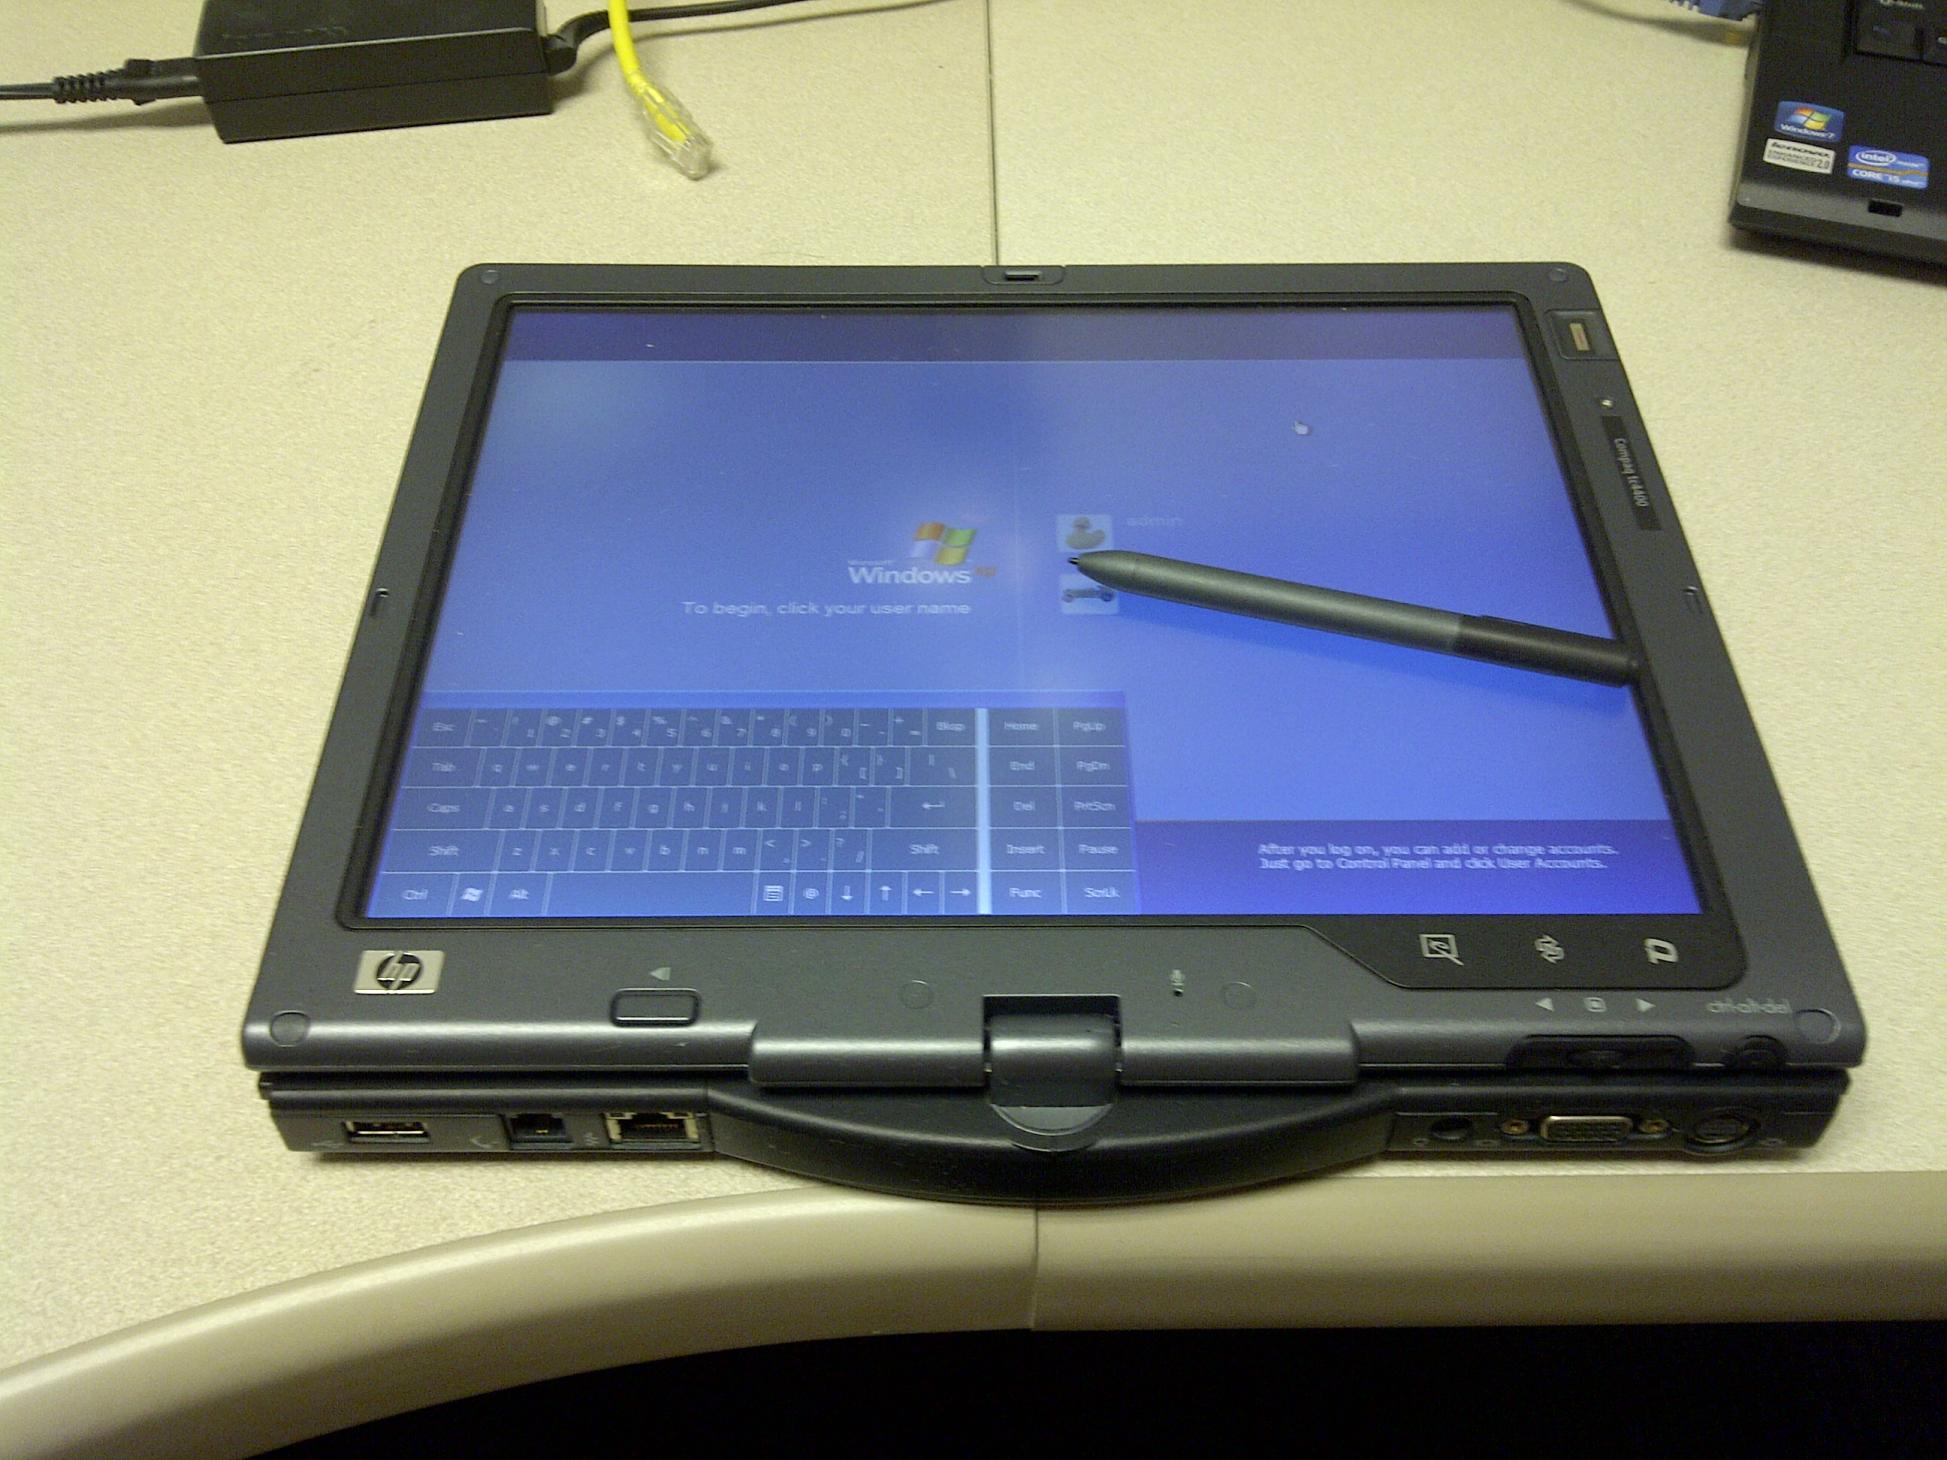 Wtt Hp Laptop Tc4400 For Tekin Pro4 Spektrum R C